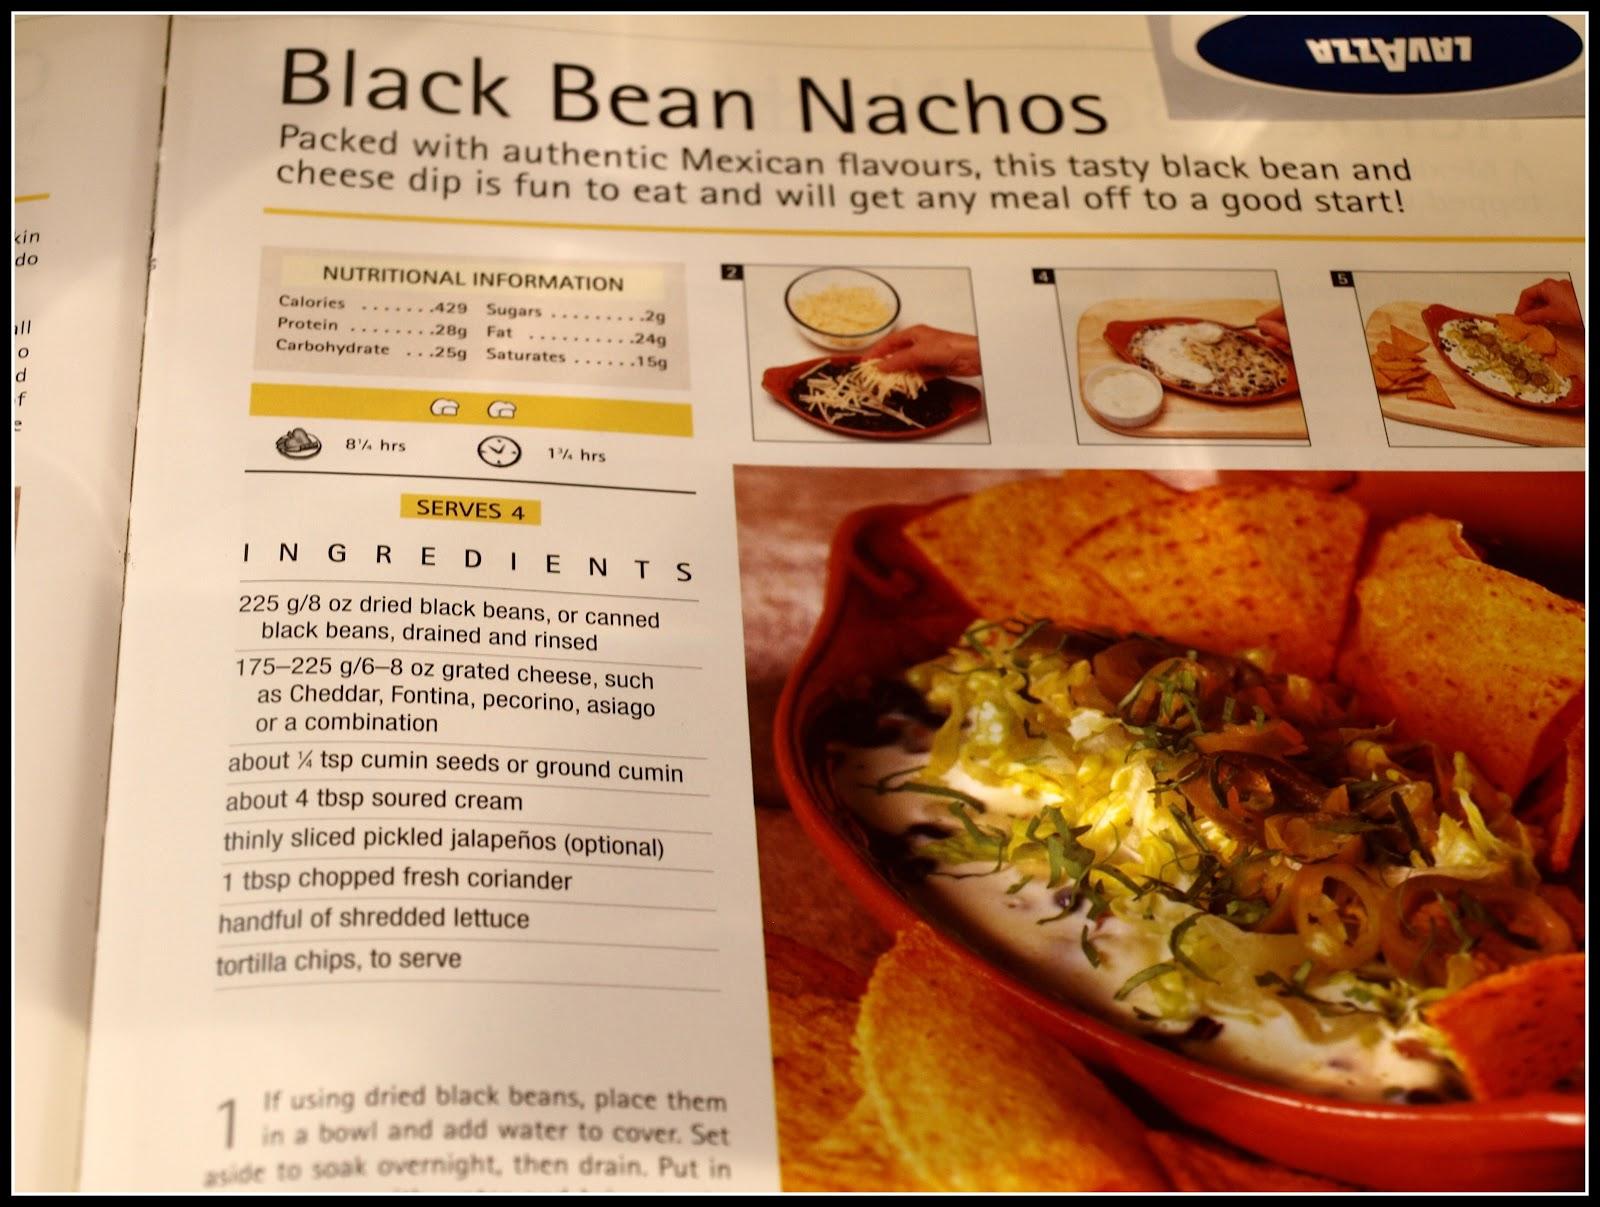 Mark's Veg Plot: Black Bean Nachos